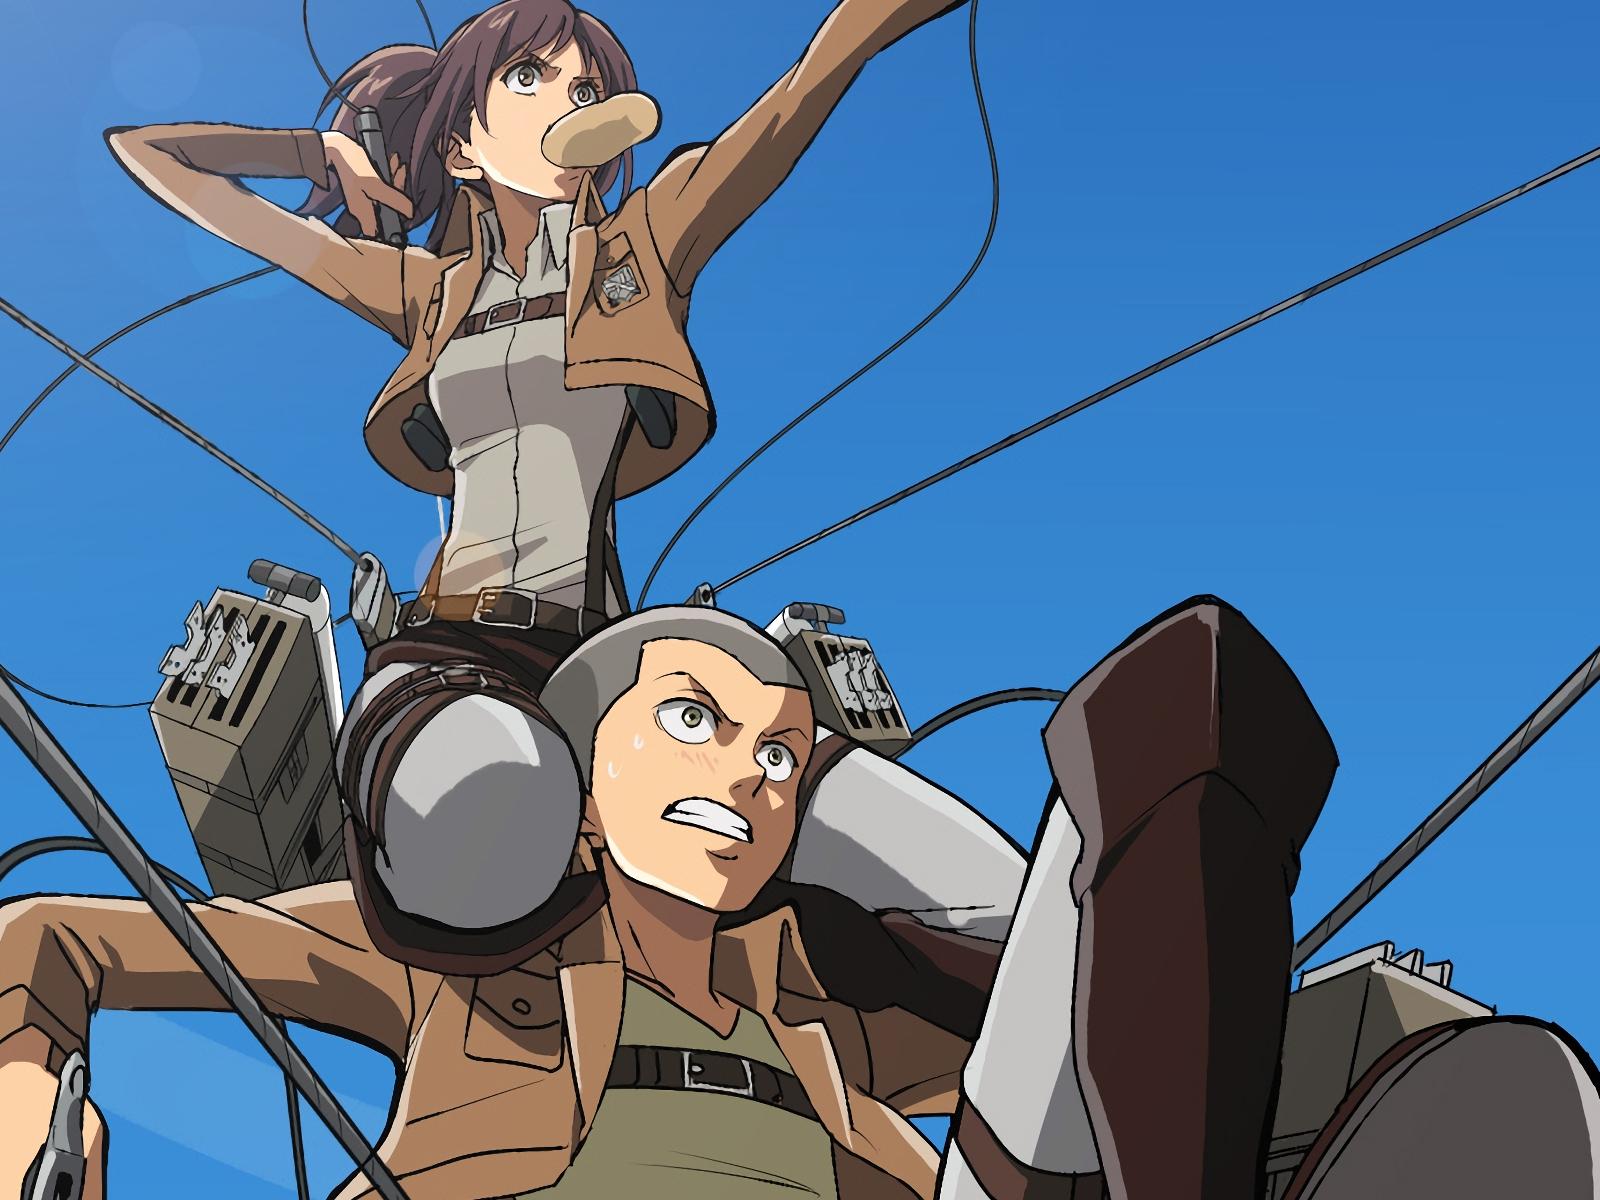 Desktop Wallpaper Sasha Blouse Attack On Titan Anime Girl Hd Image Picture Background Vkuqwz